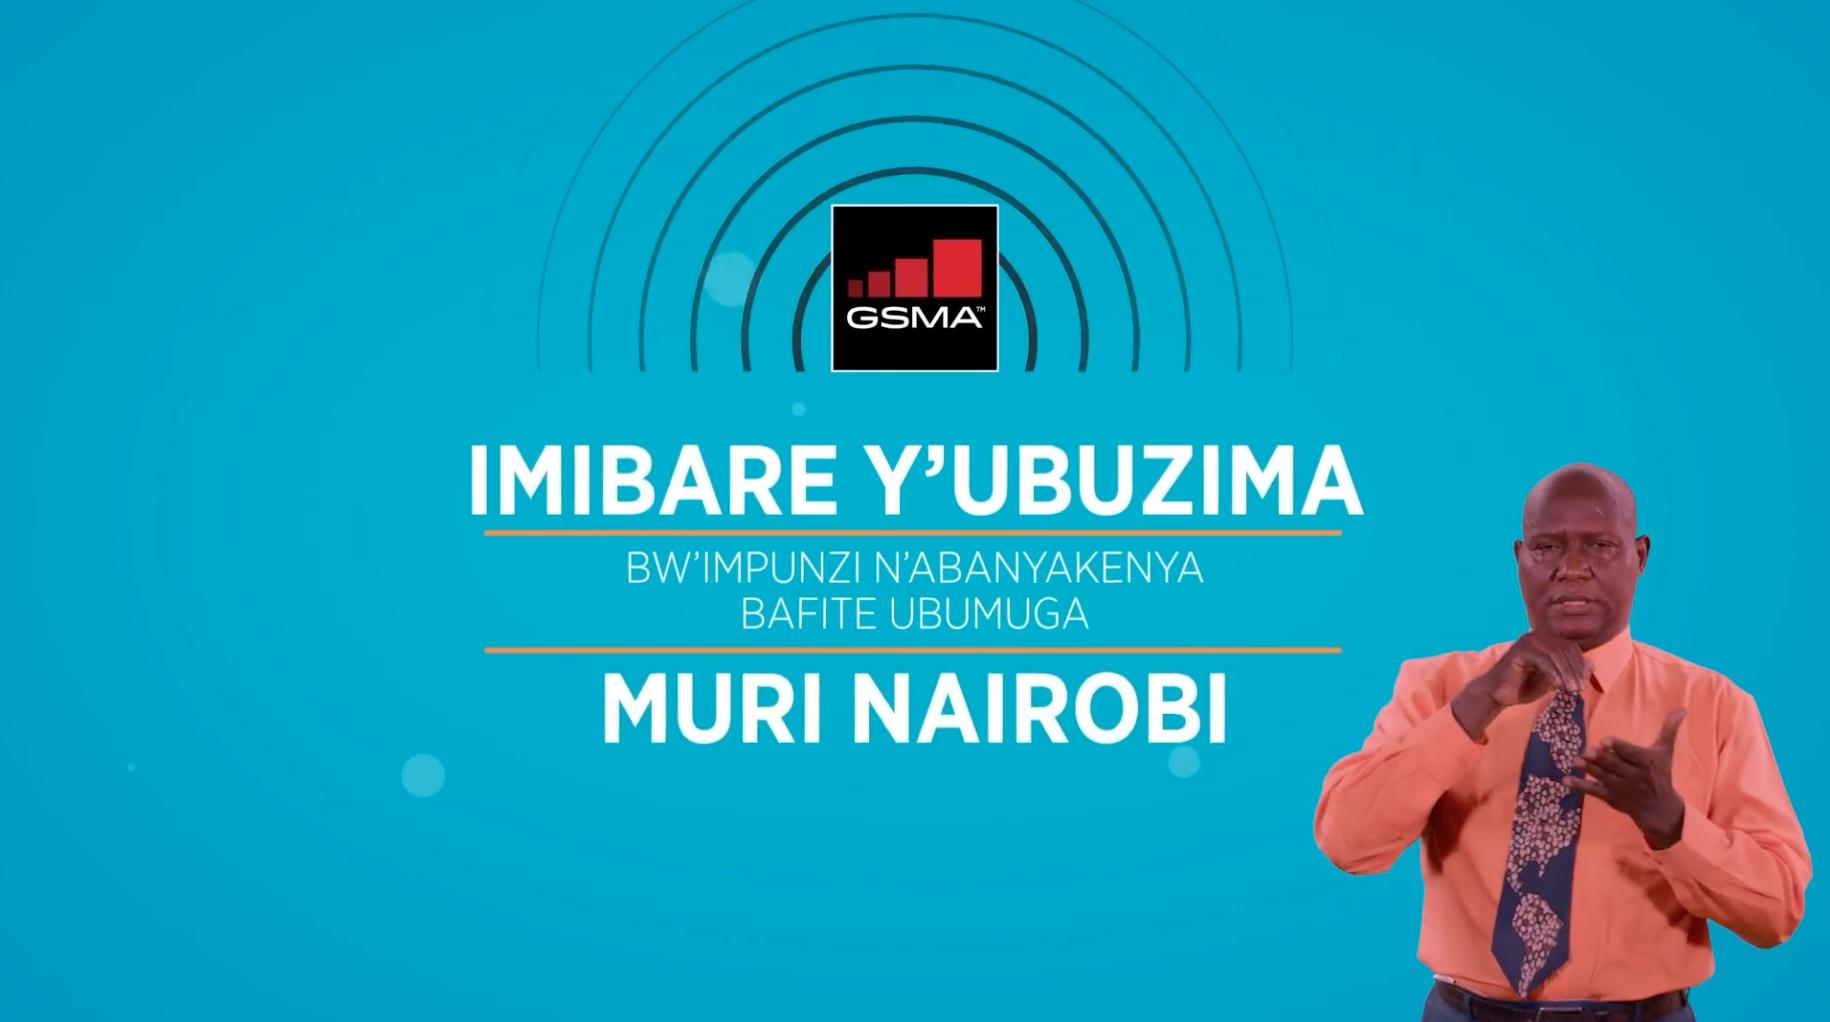 Screen of video title screen in Kinyamulenge. Text reads: Imibare y'ubuzimo bw'impunzi n'Abanyakenya bafite ubumuga muri Nairobi